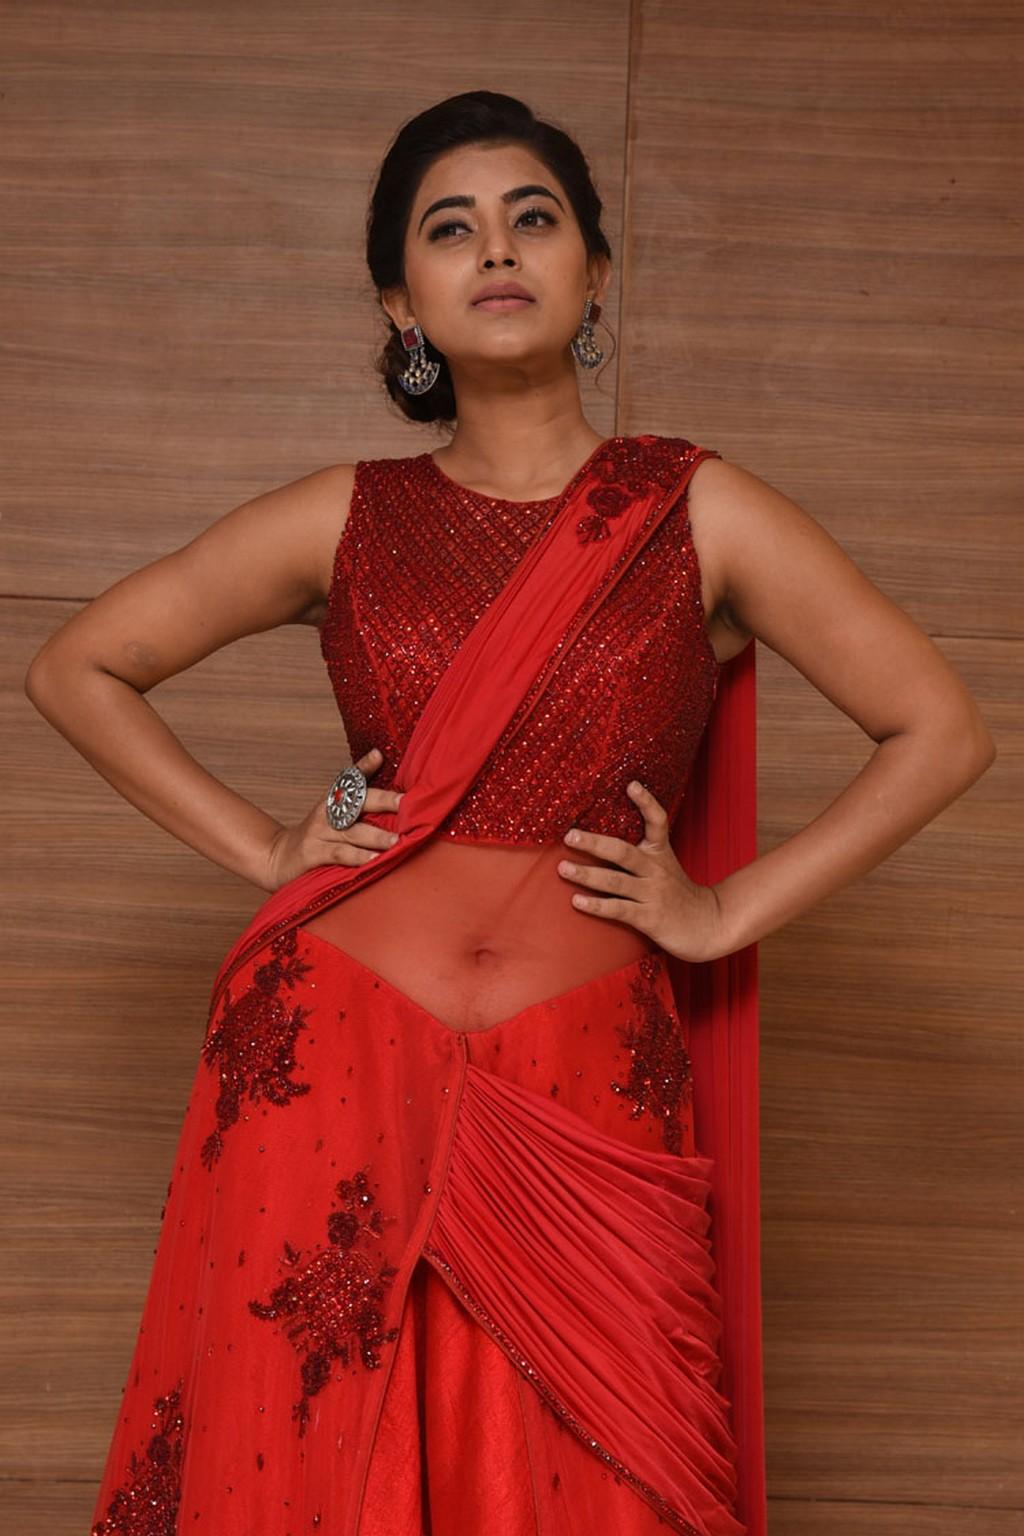 Yamini Bhaskar at Bhale Manchi Chowka Beram Pre Release   Indian Girls Villa - Celebs Beauty, Fashion and Entertainment